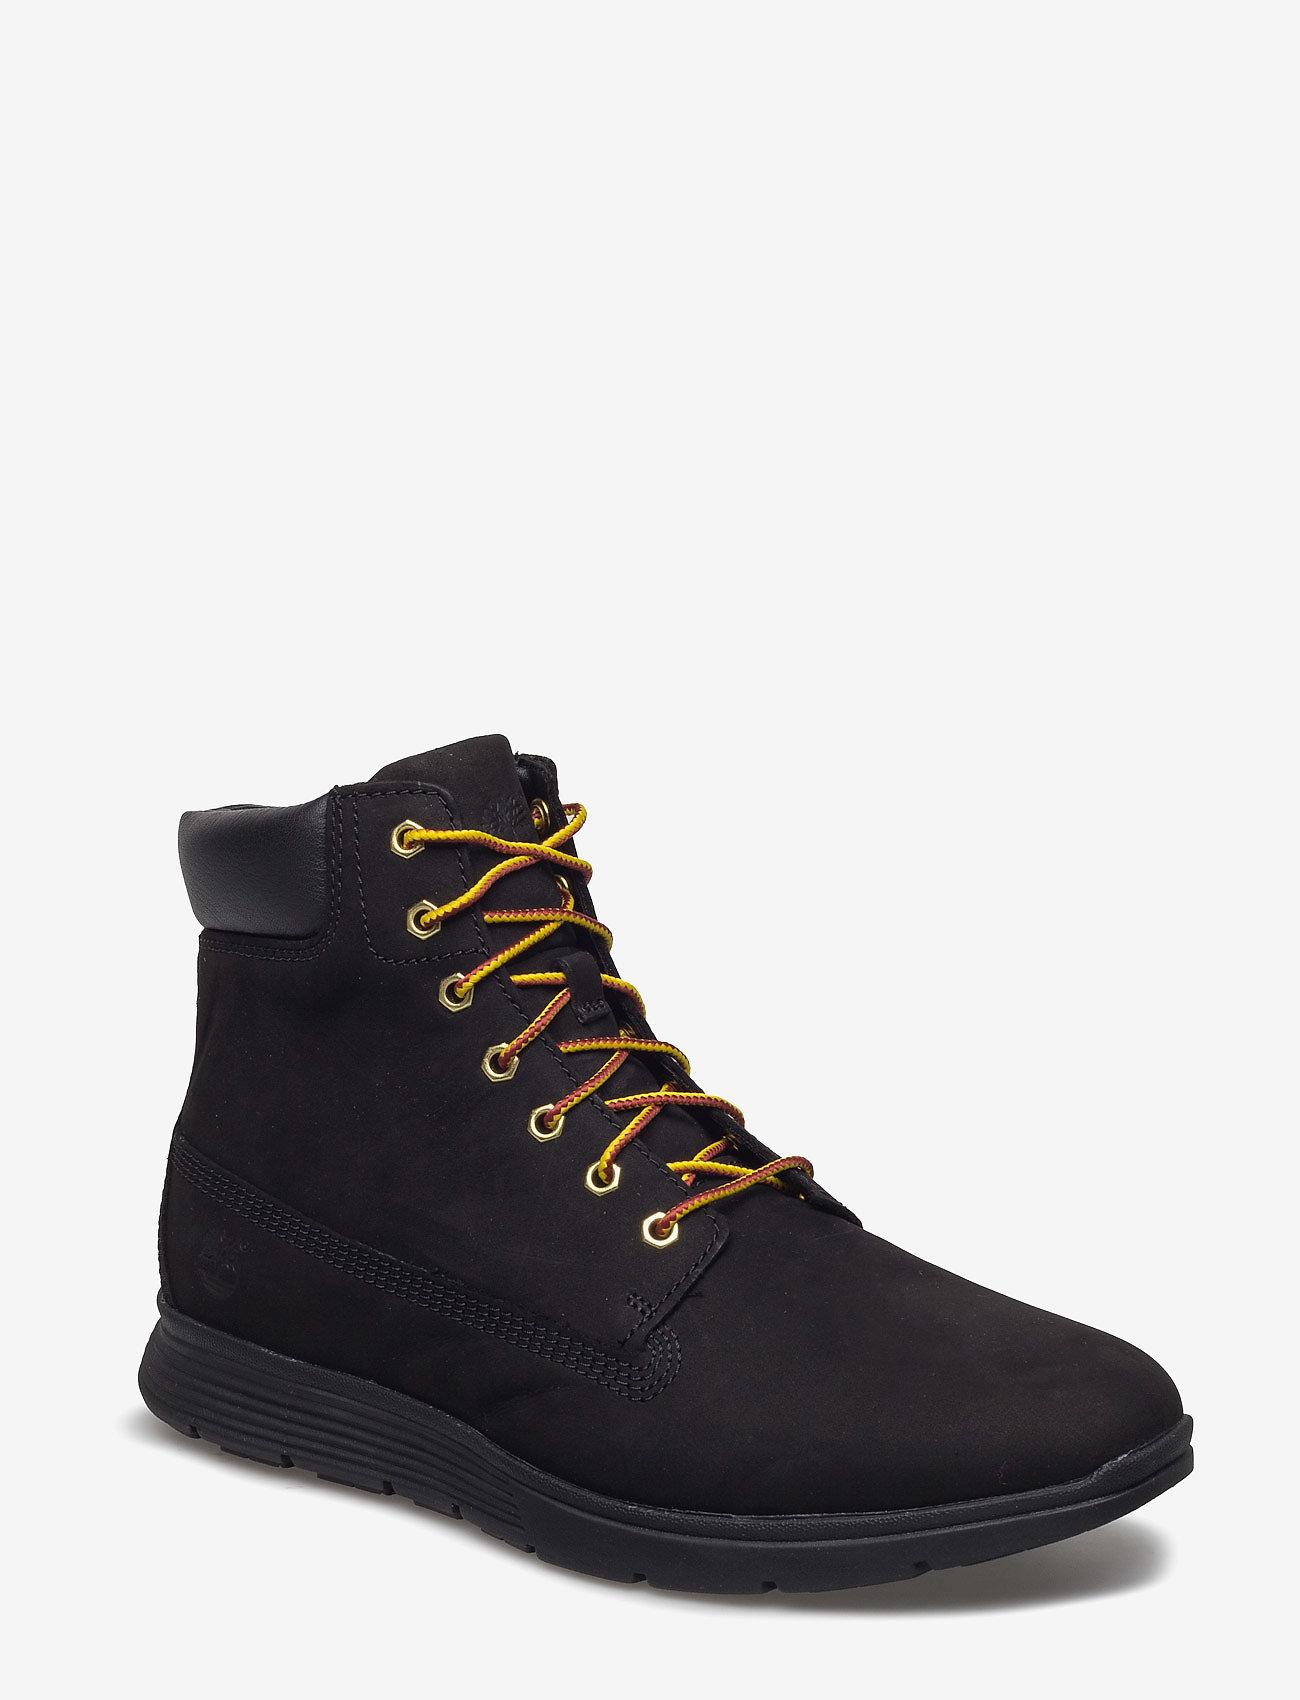 Boozt Boots   thescrapbook